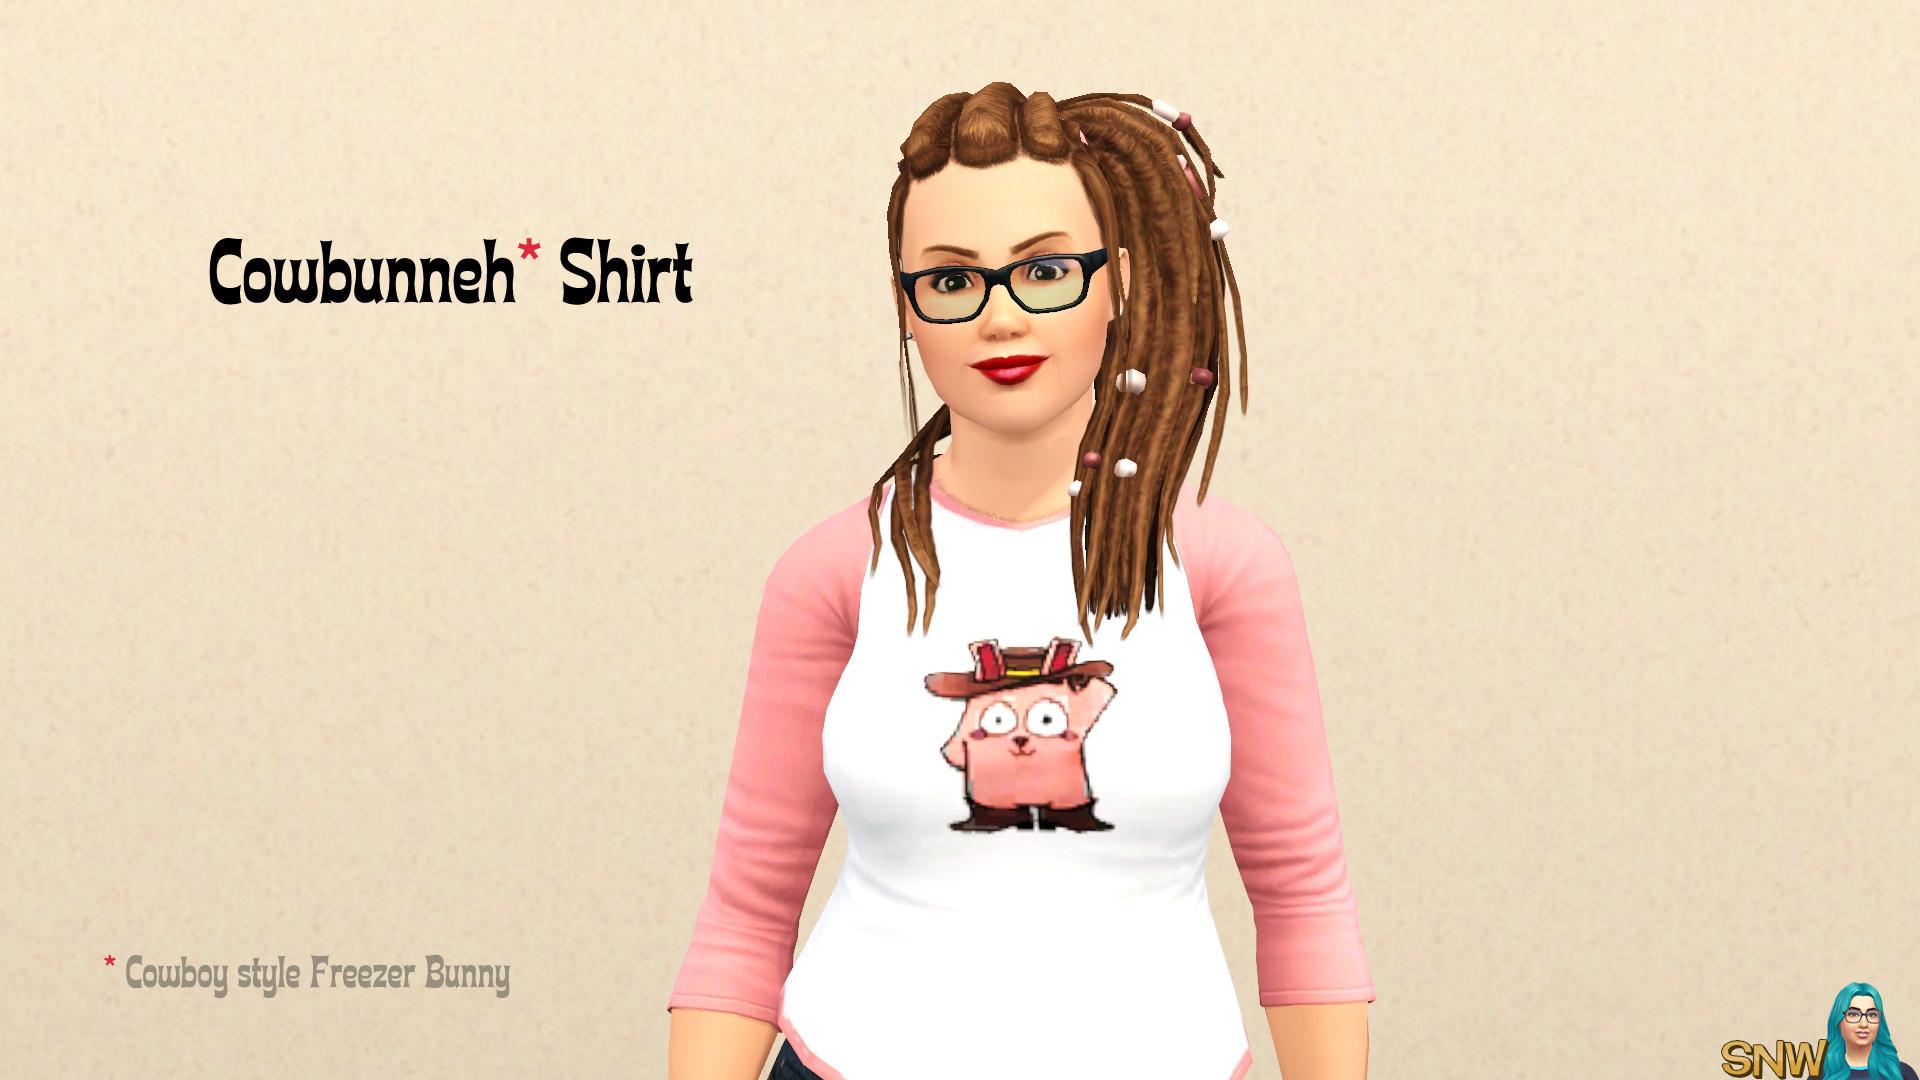 Cowbunneh Shirt